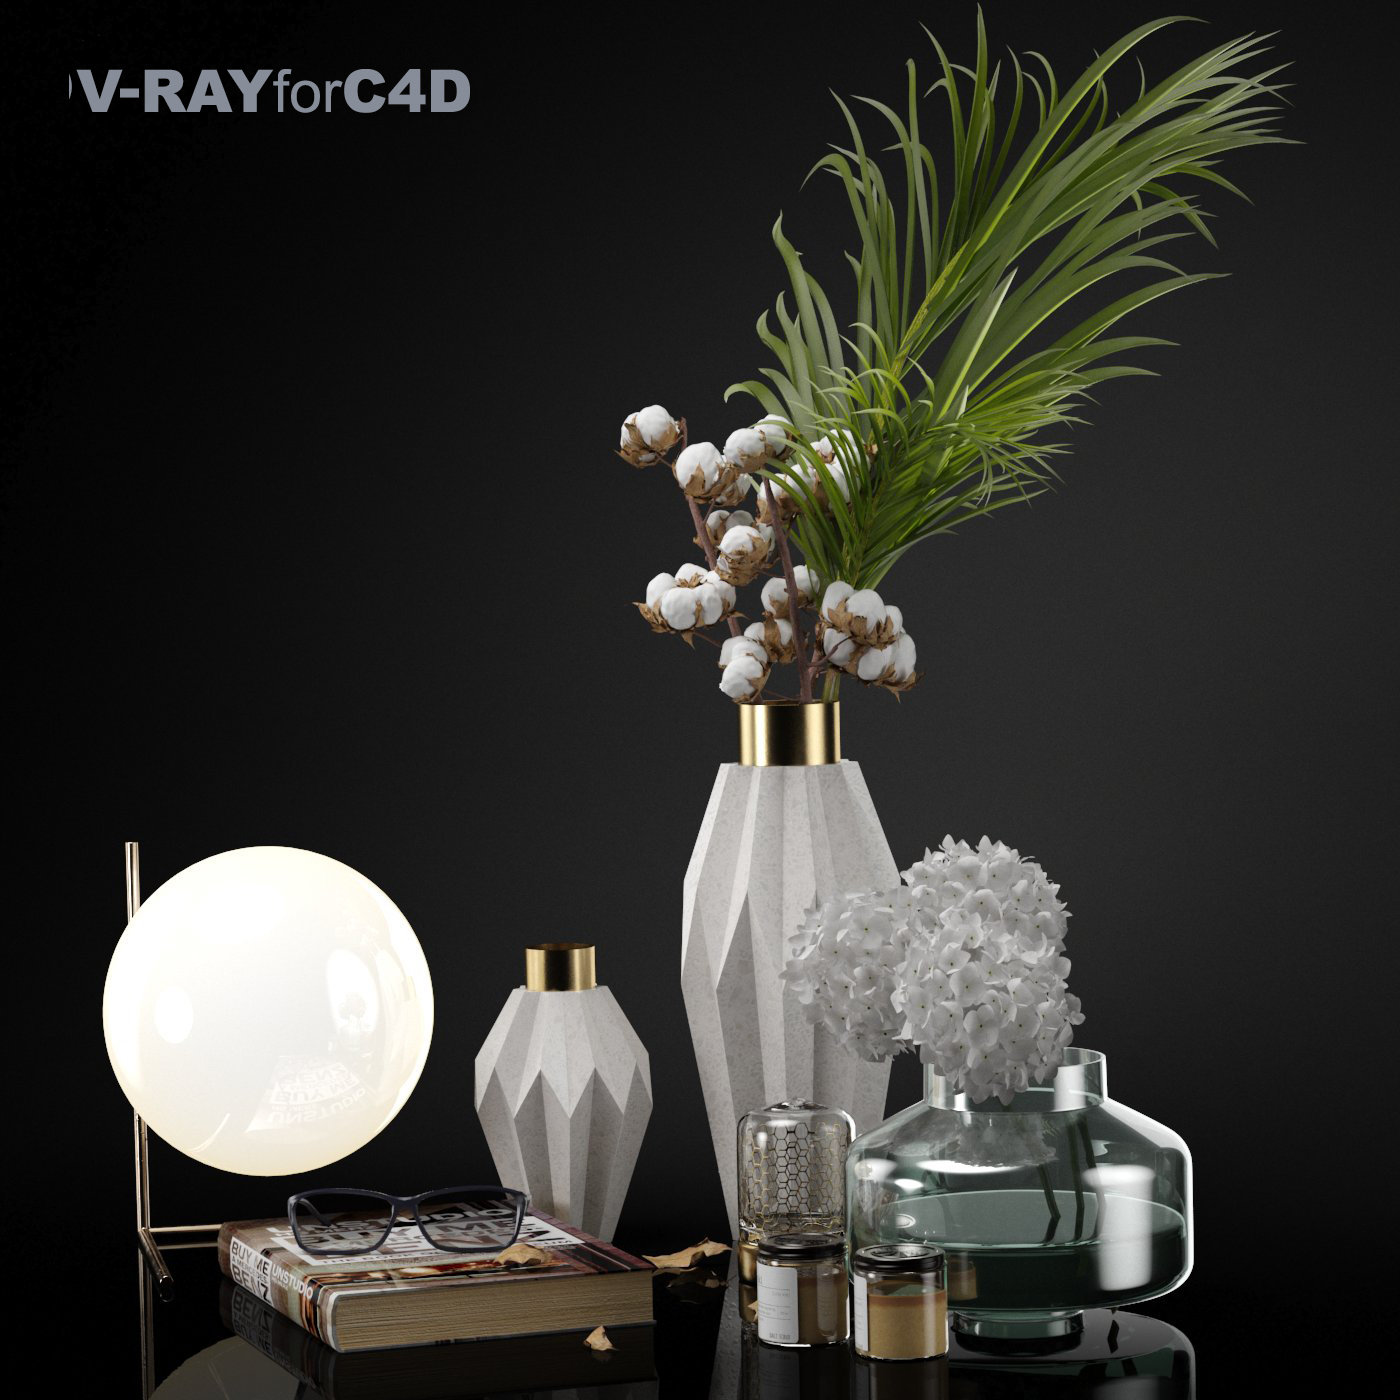 Decorative set 002 C4D